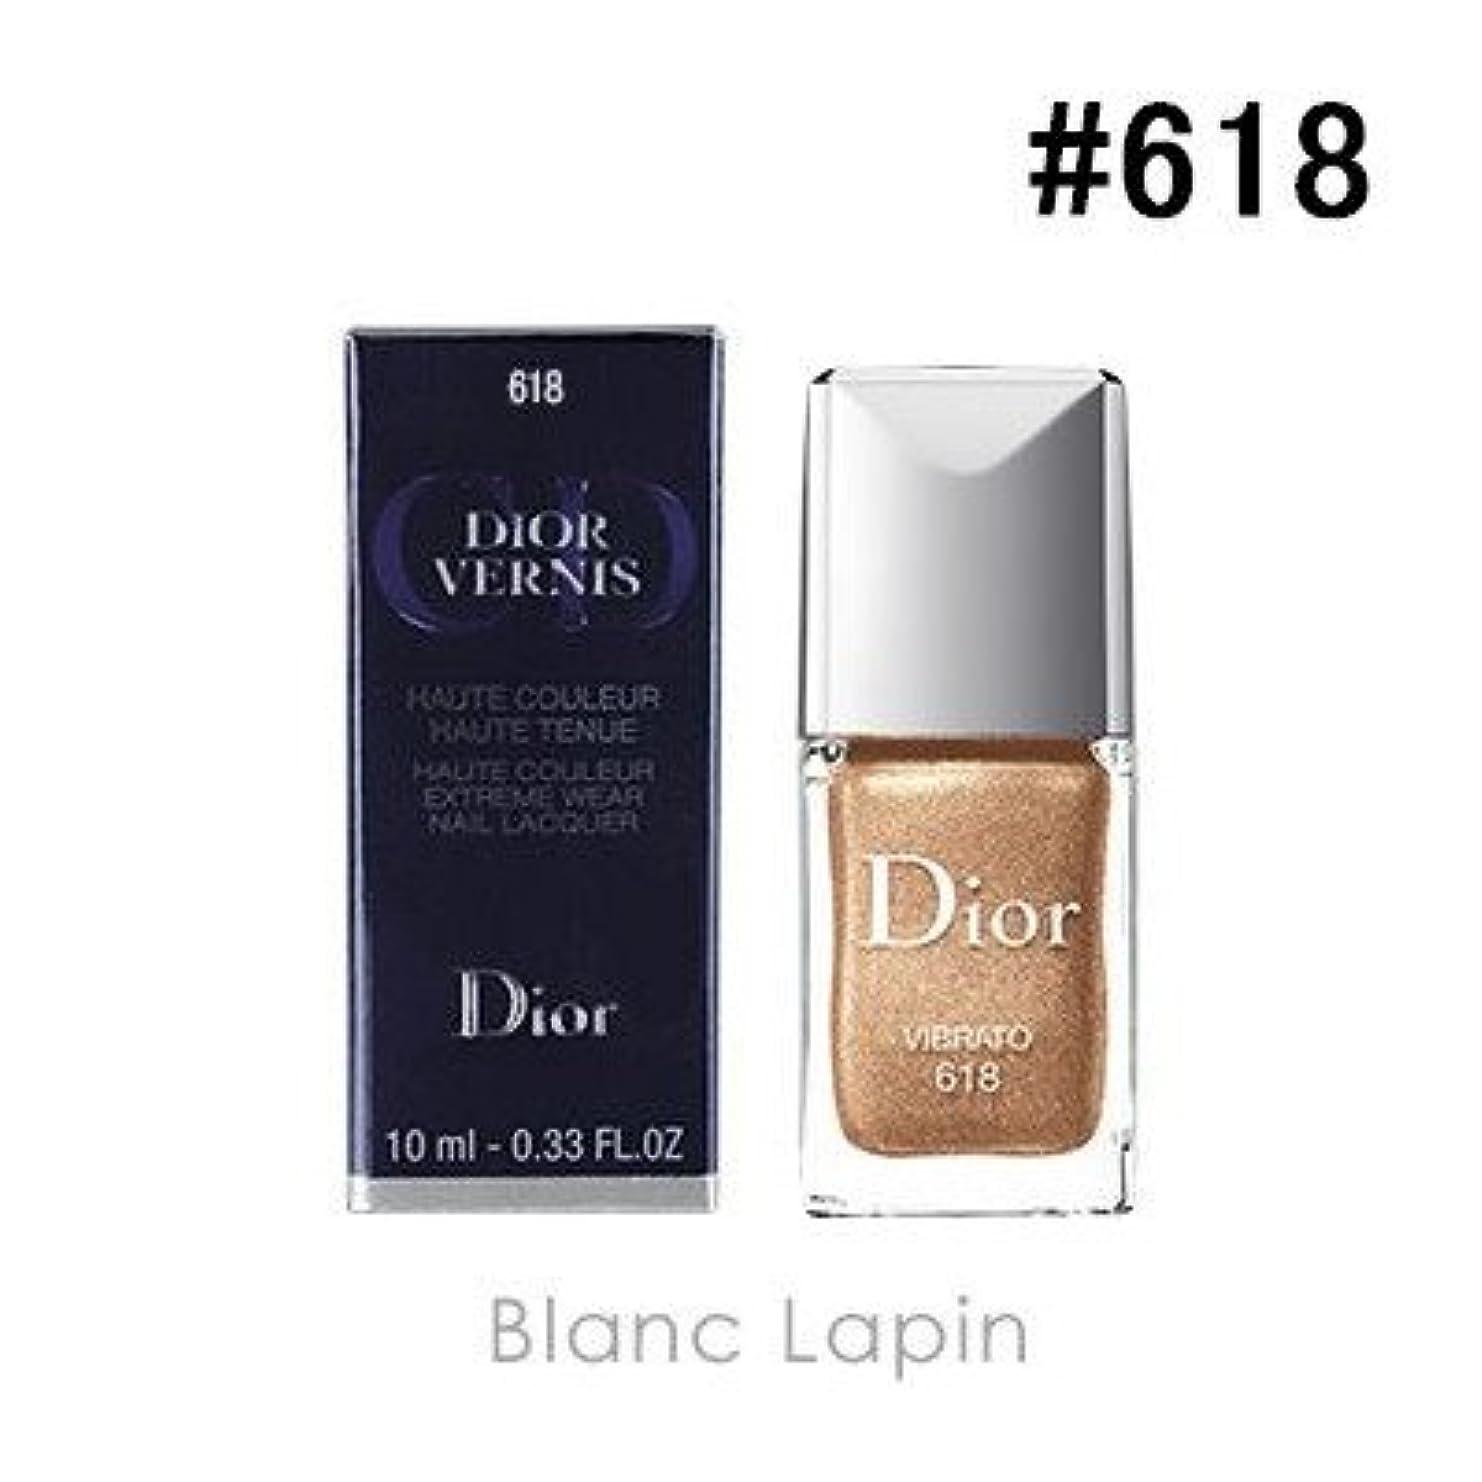 Dior ディオールヴェルニ #618 ビブラート 10ml [208208] [並行輸入品]